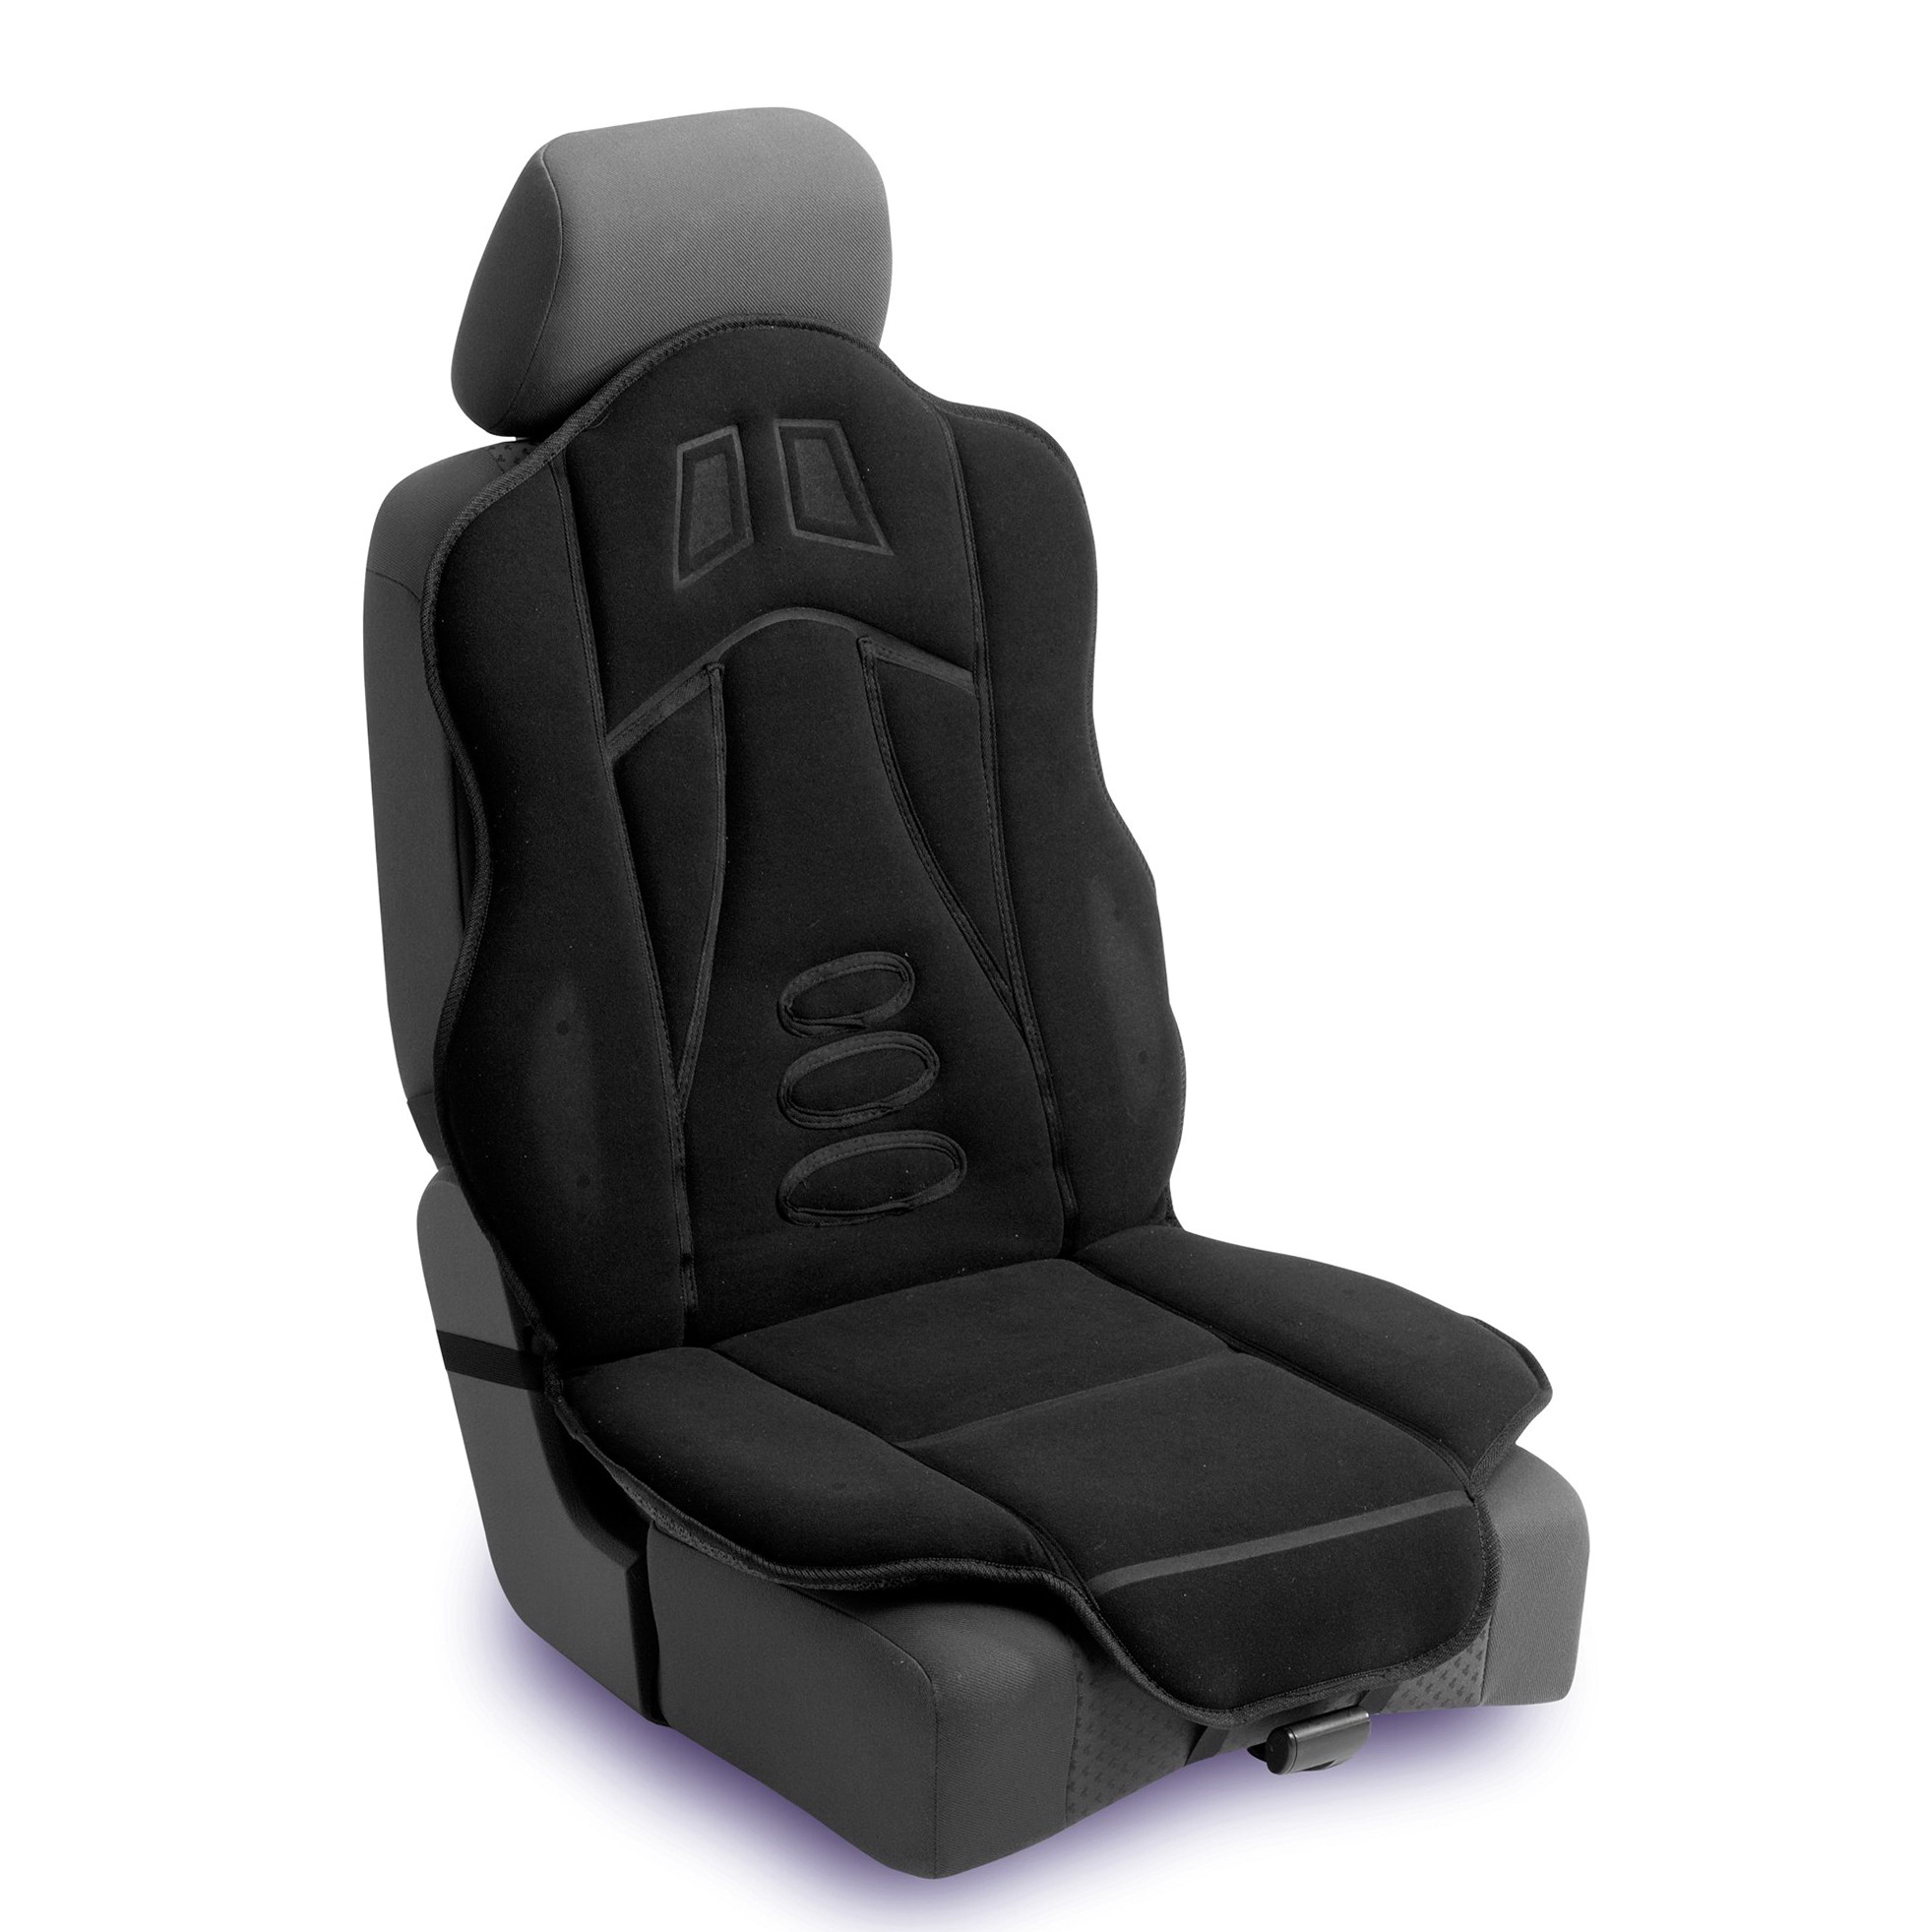 Lumbar Cushion For Car Seat